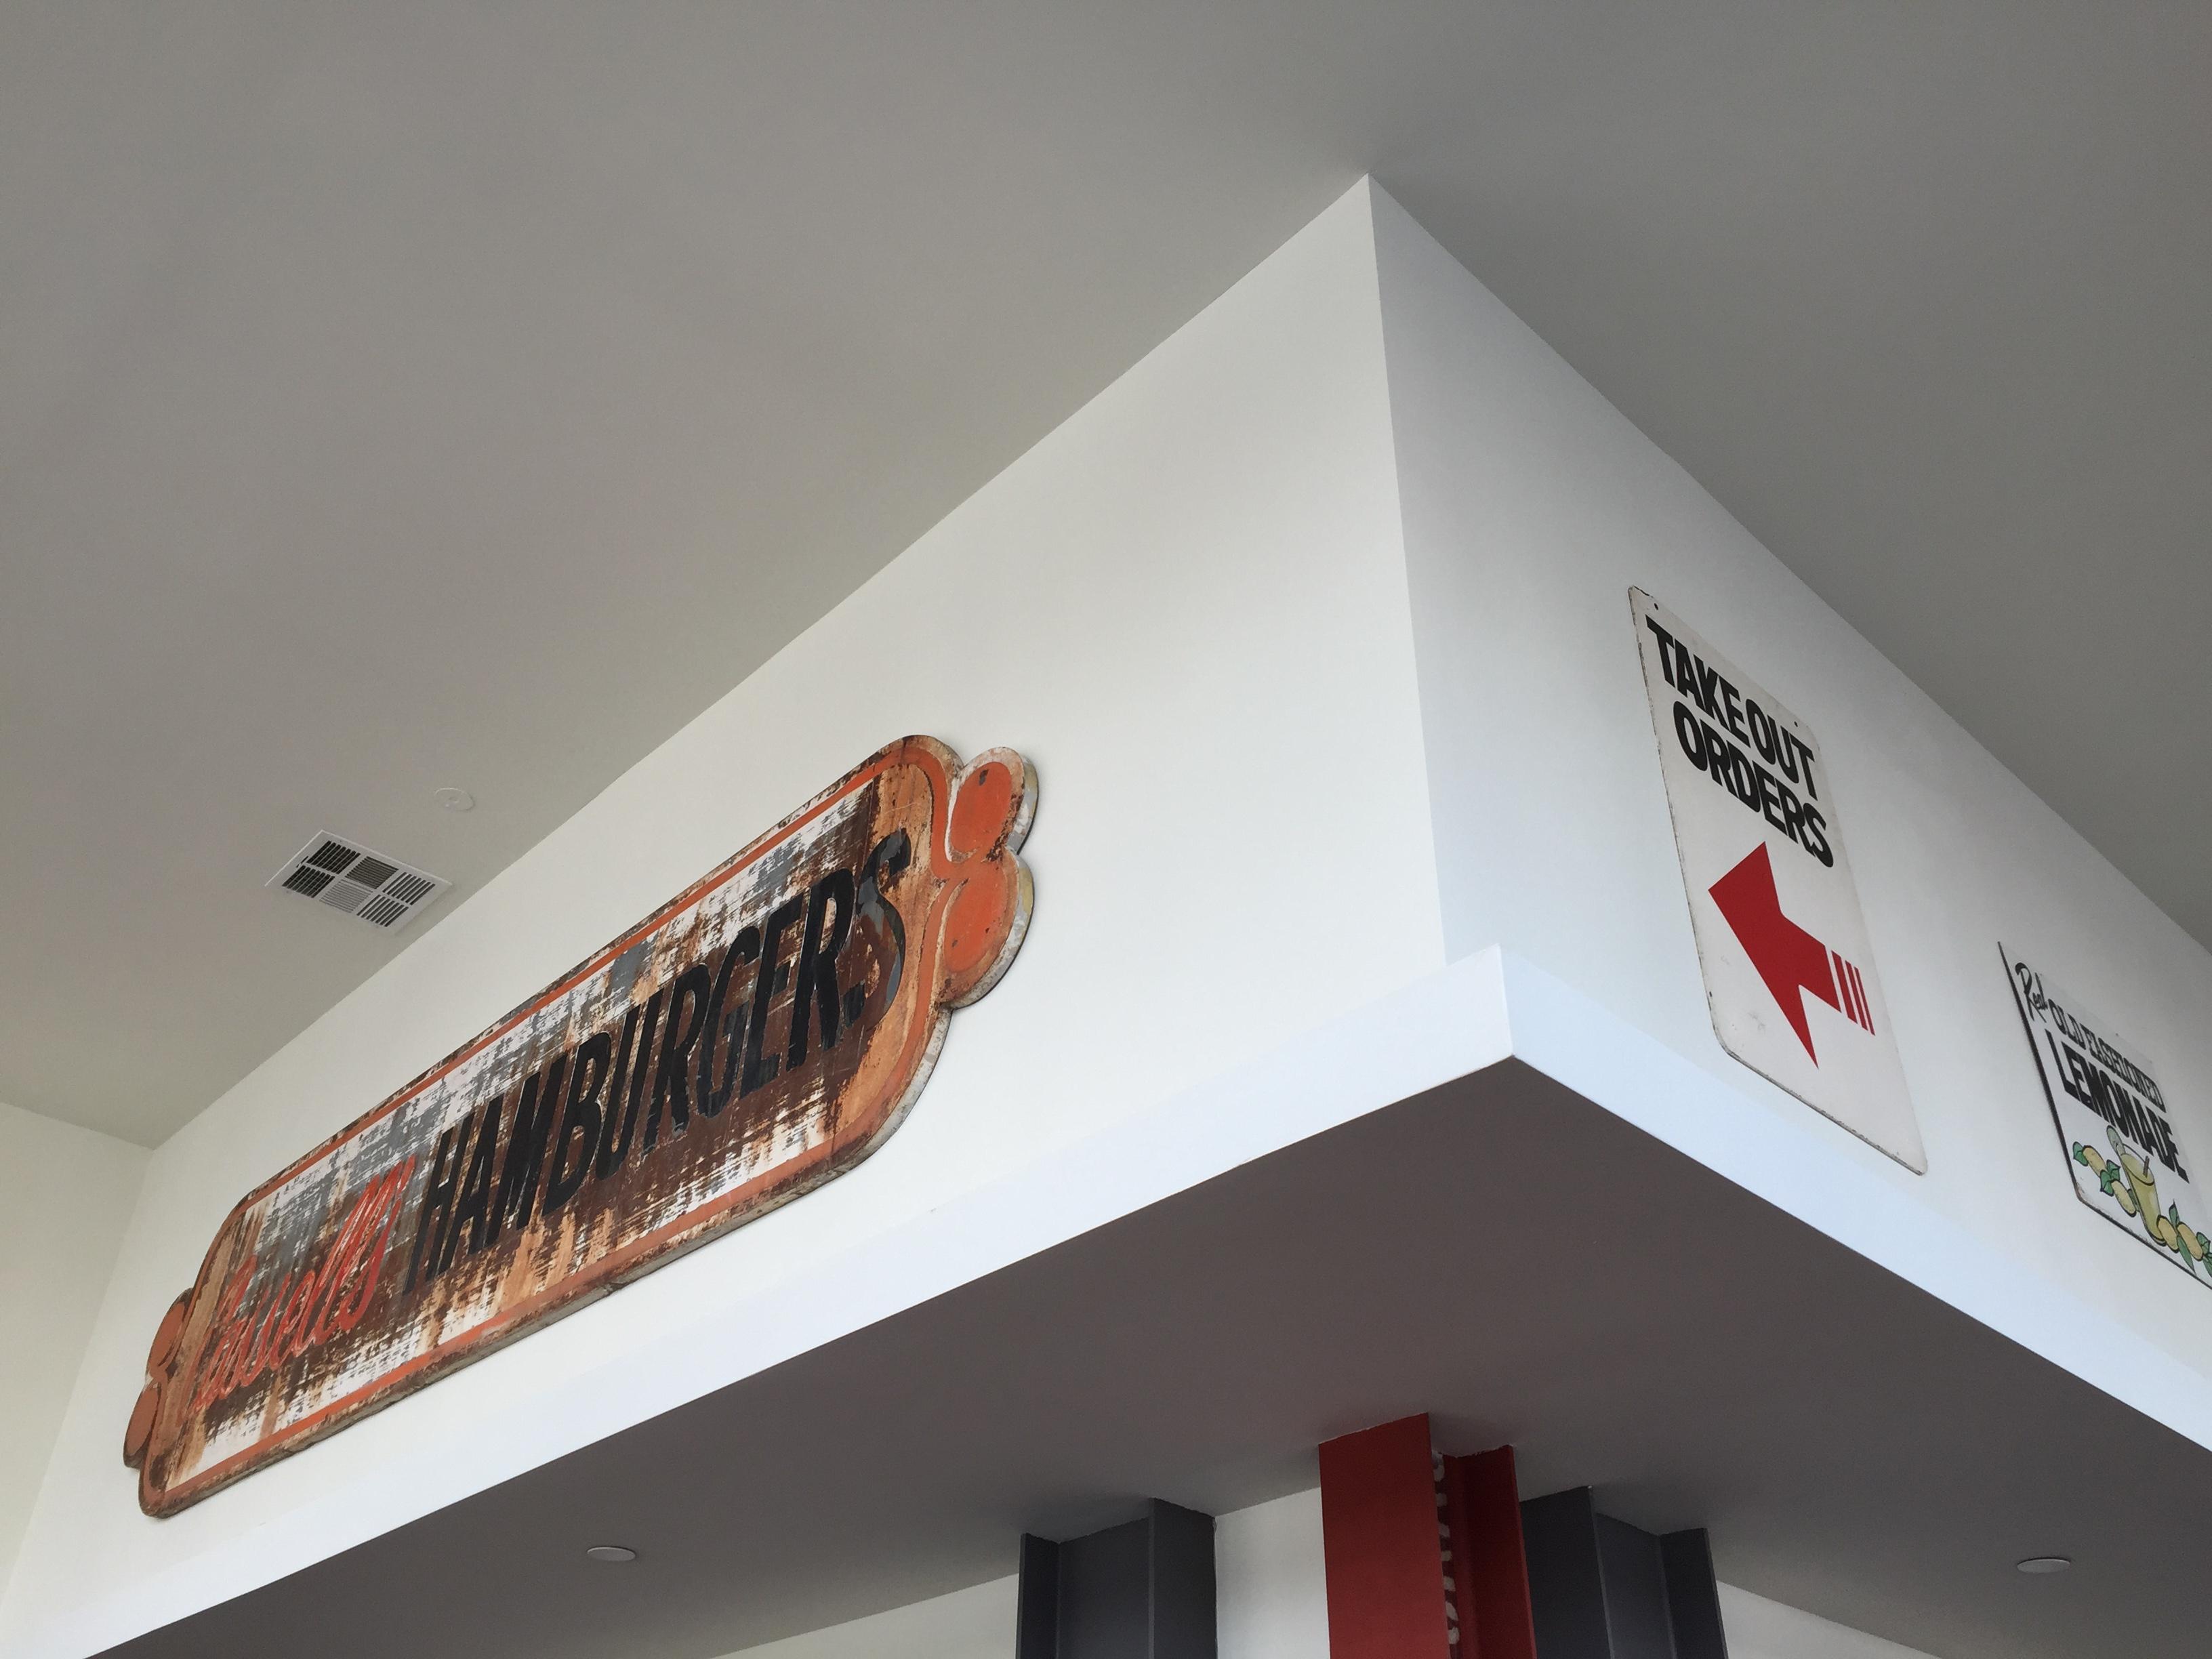 Cassell's Burgers, Koreatown